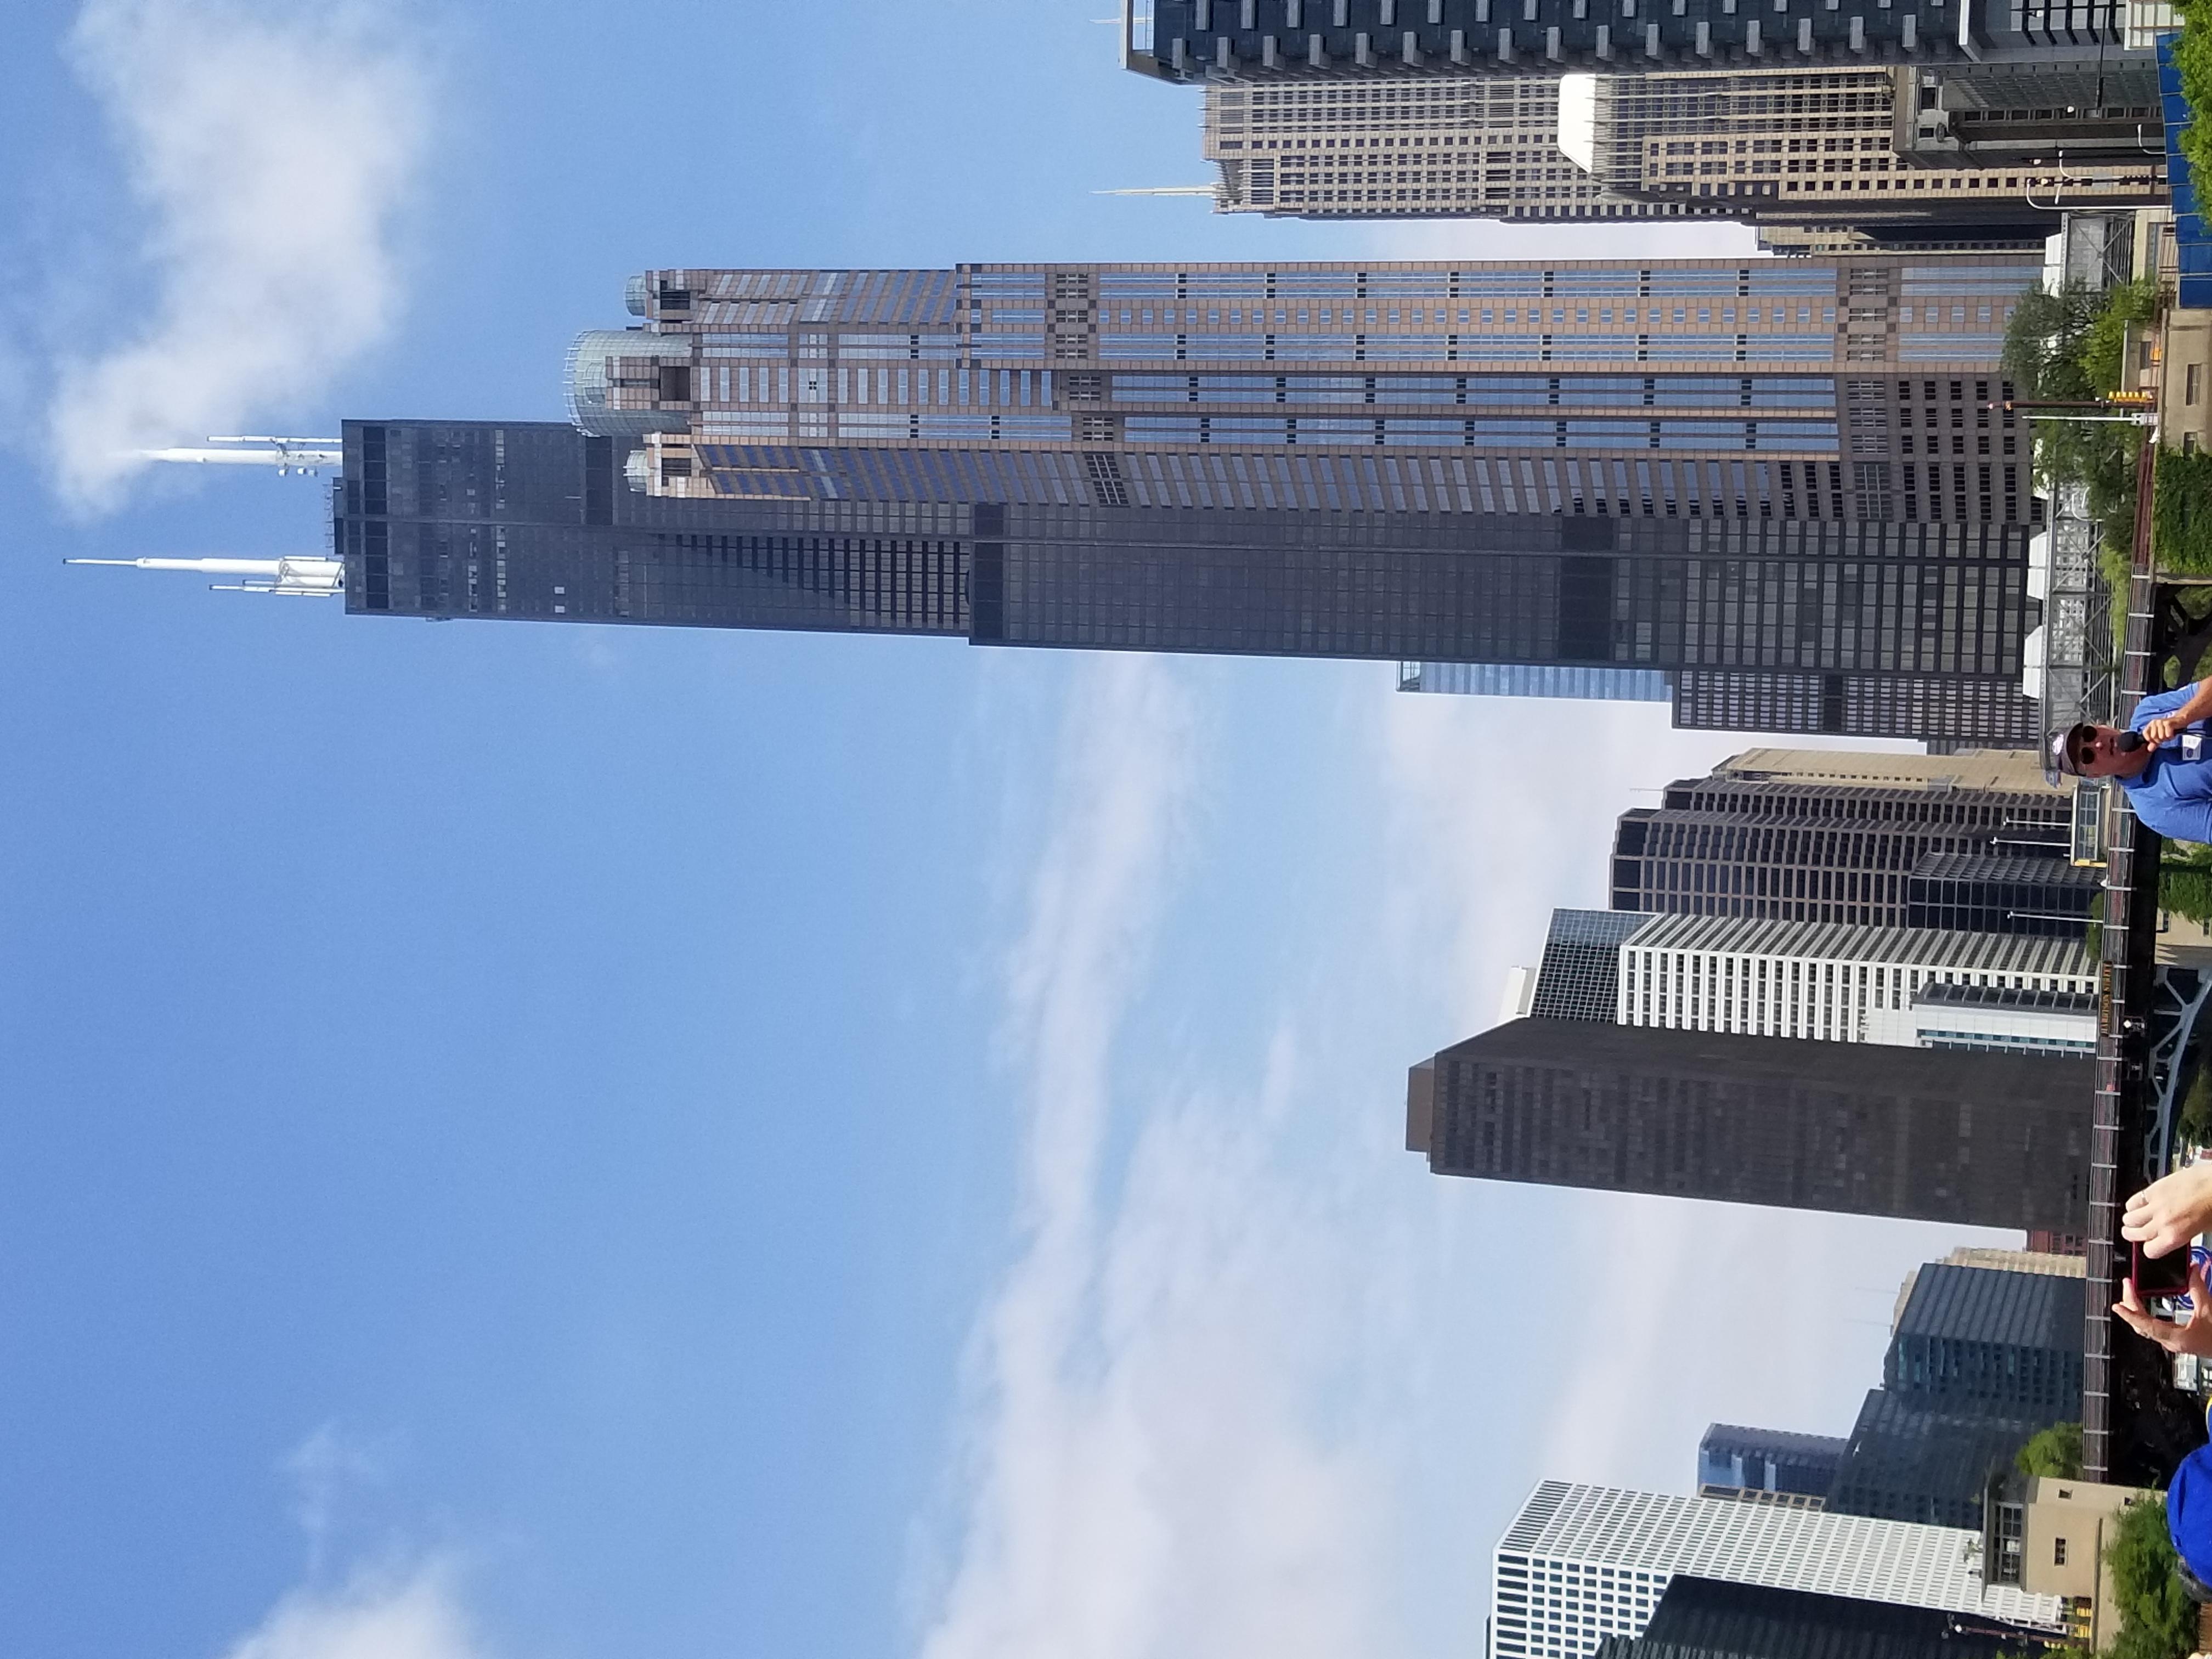 FileWillis tower chicagojpg FileWillis tower chicagojpg